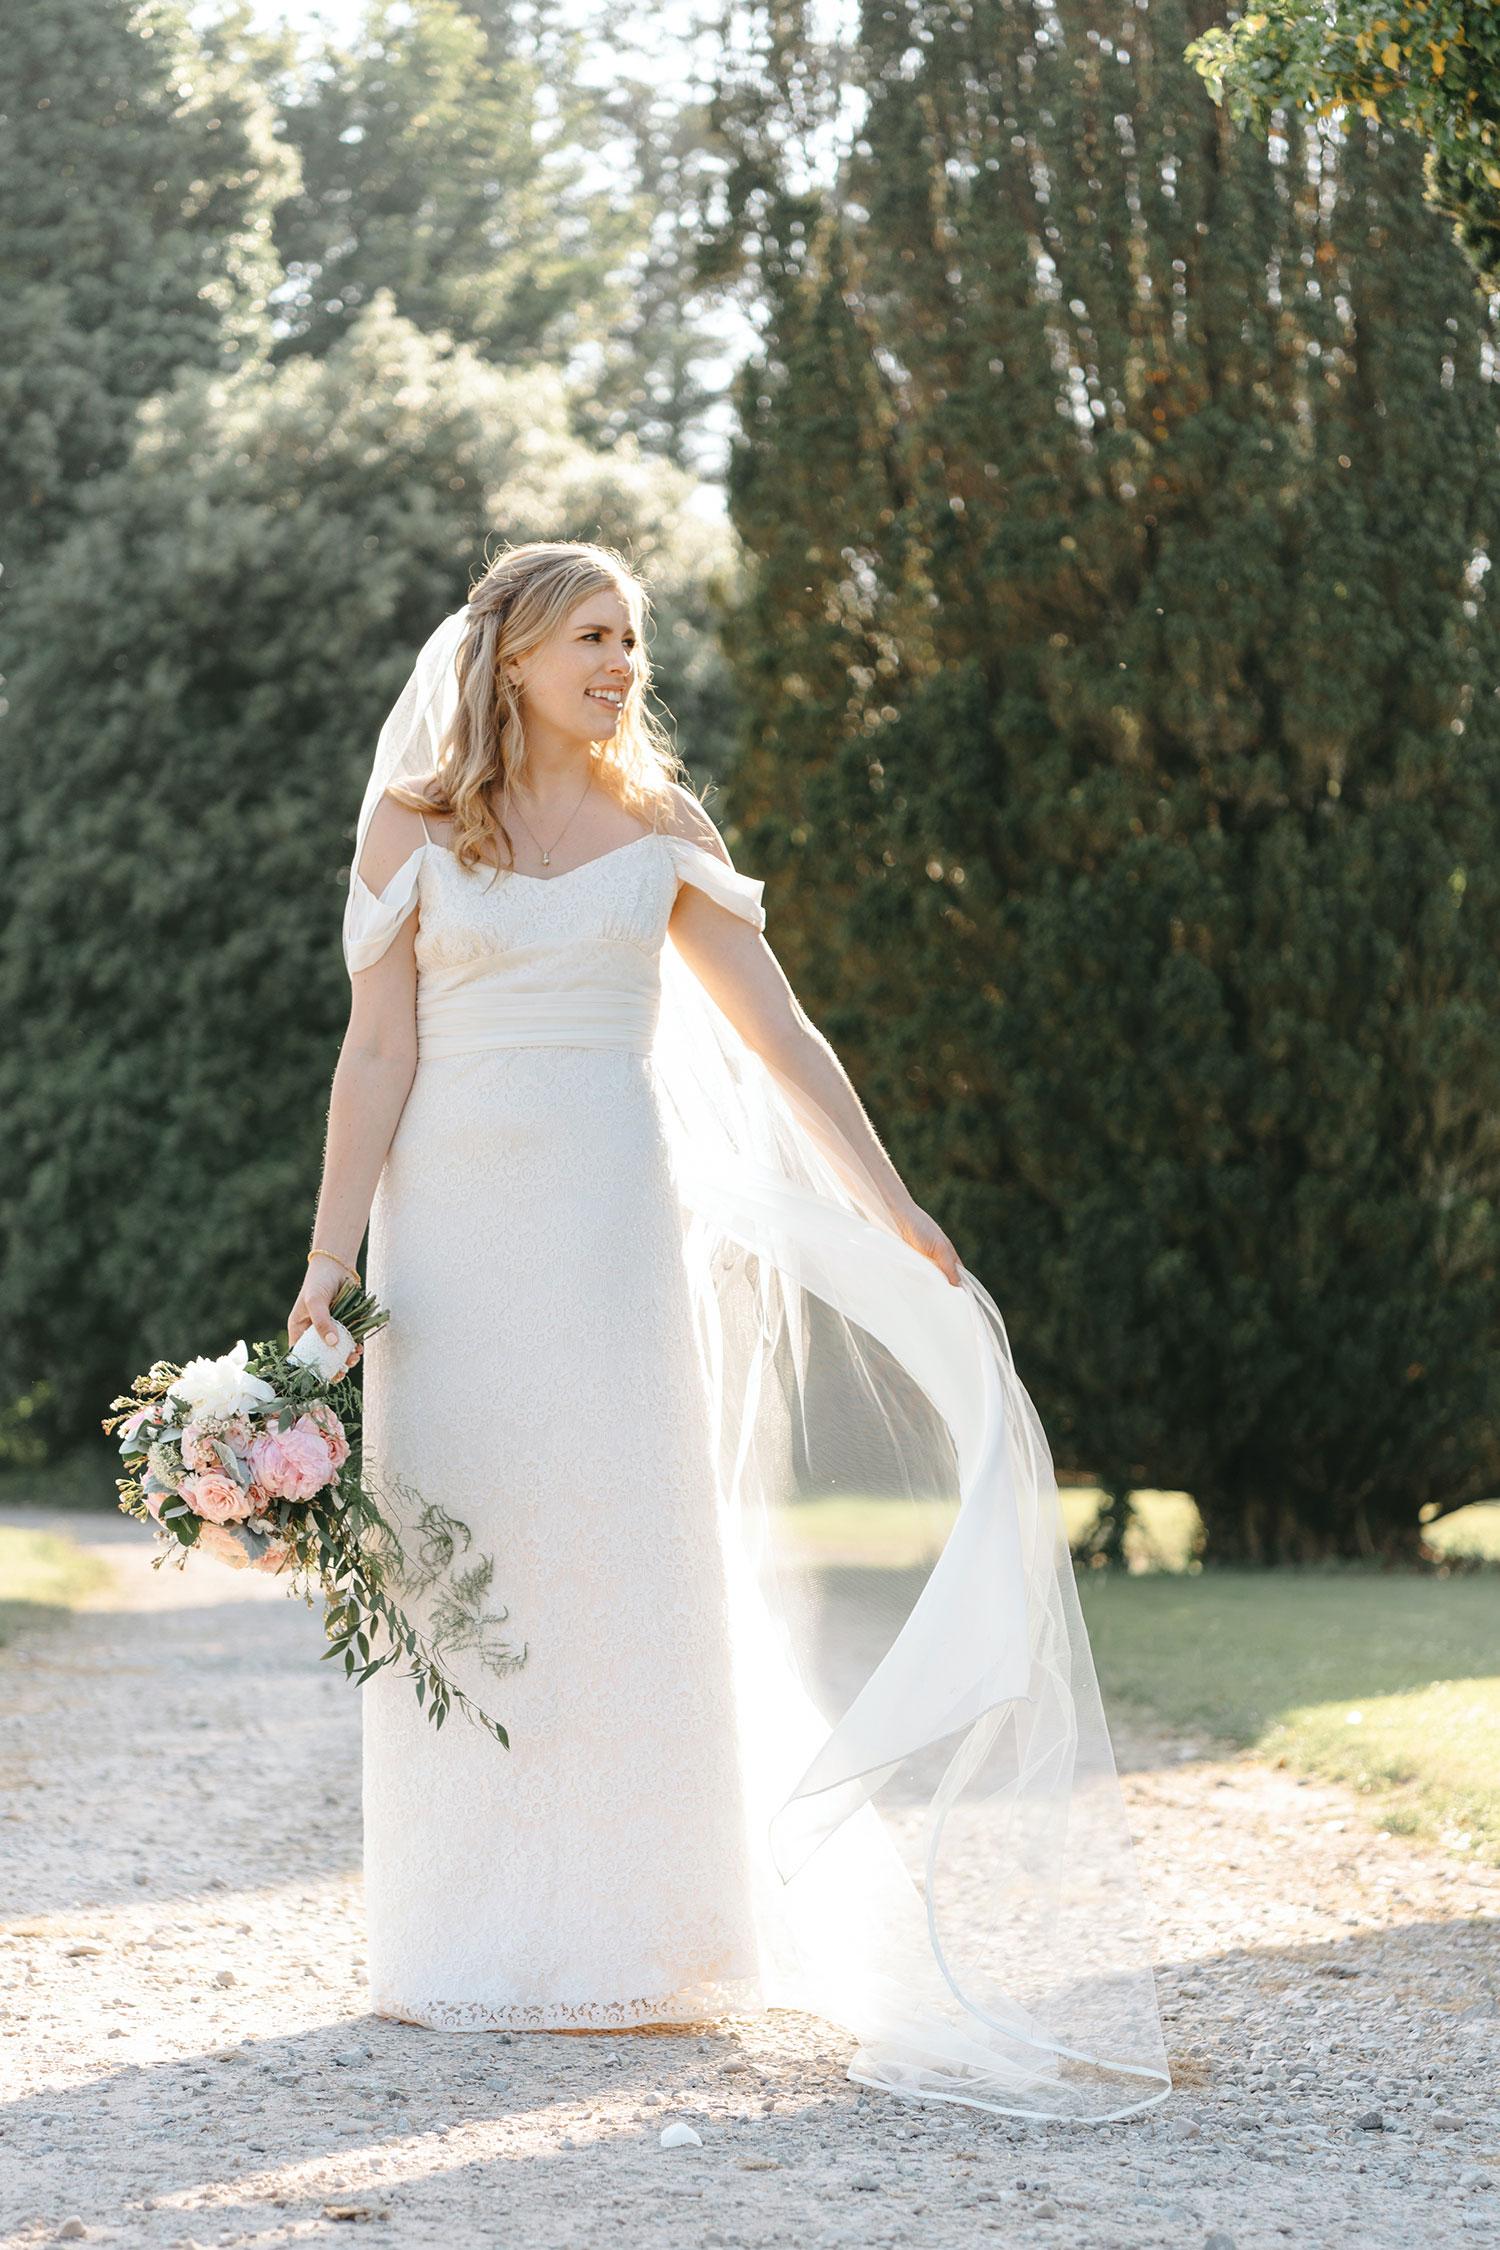 castlemartyr-wedding-photography-0107_0478.jpg